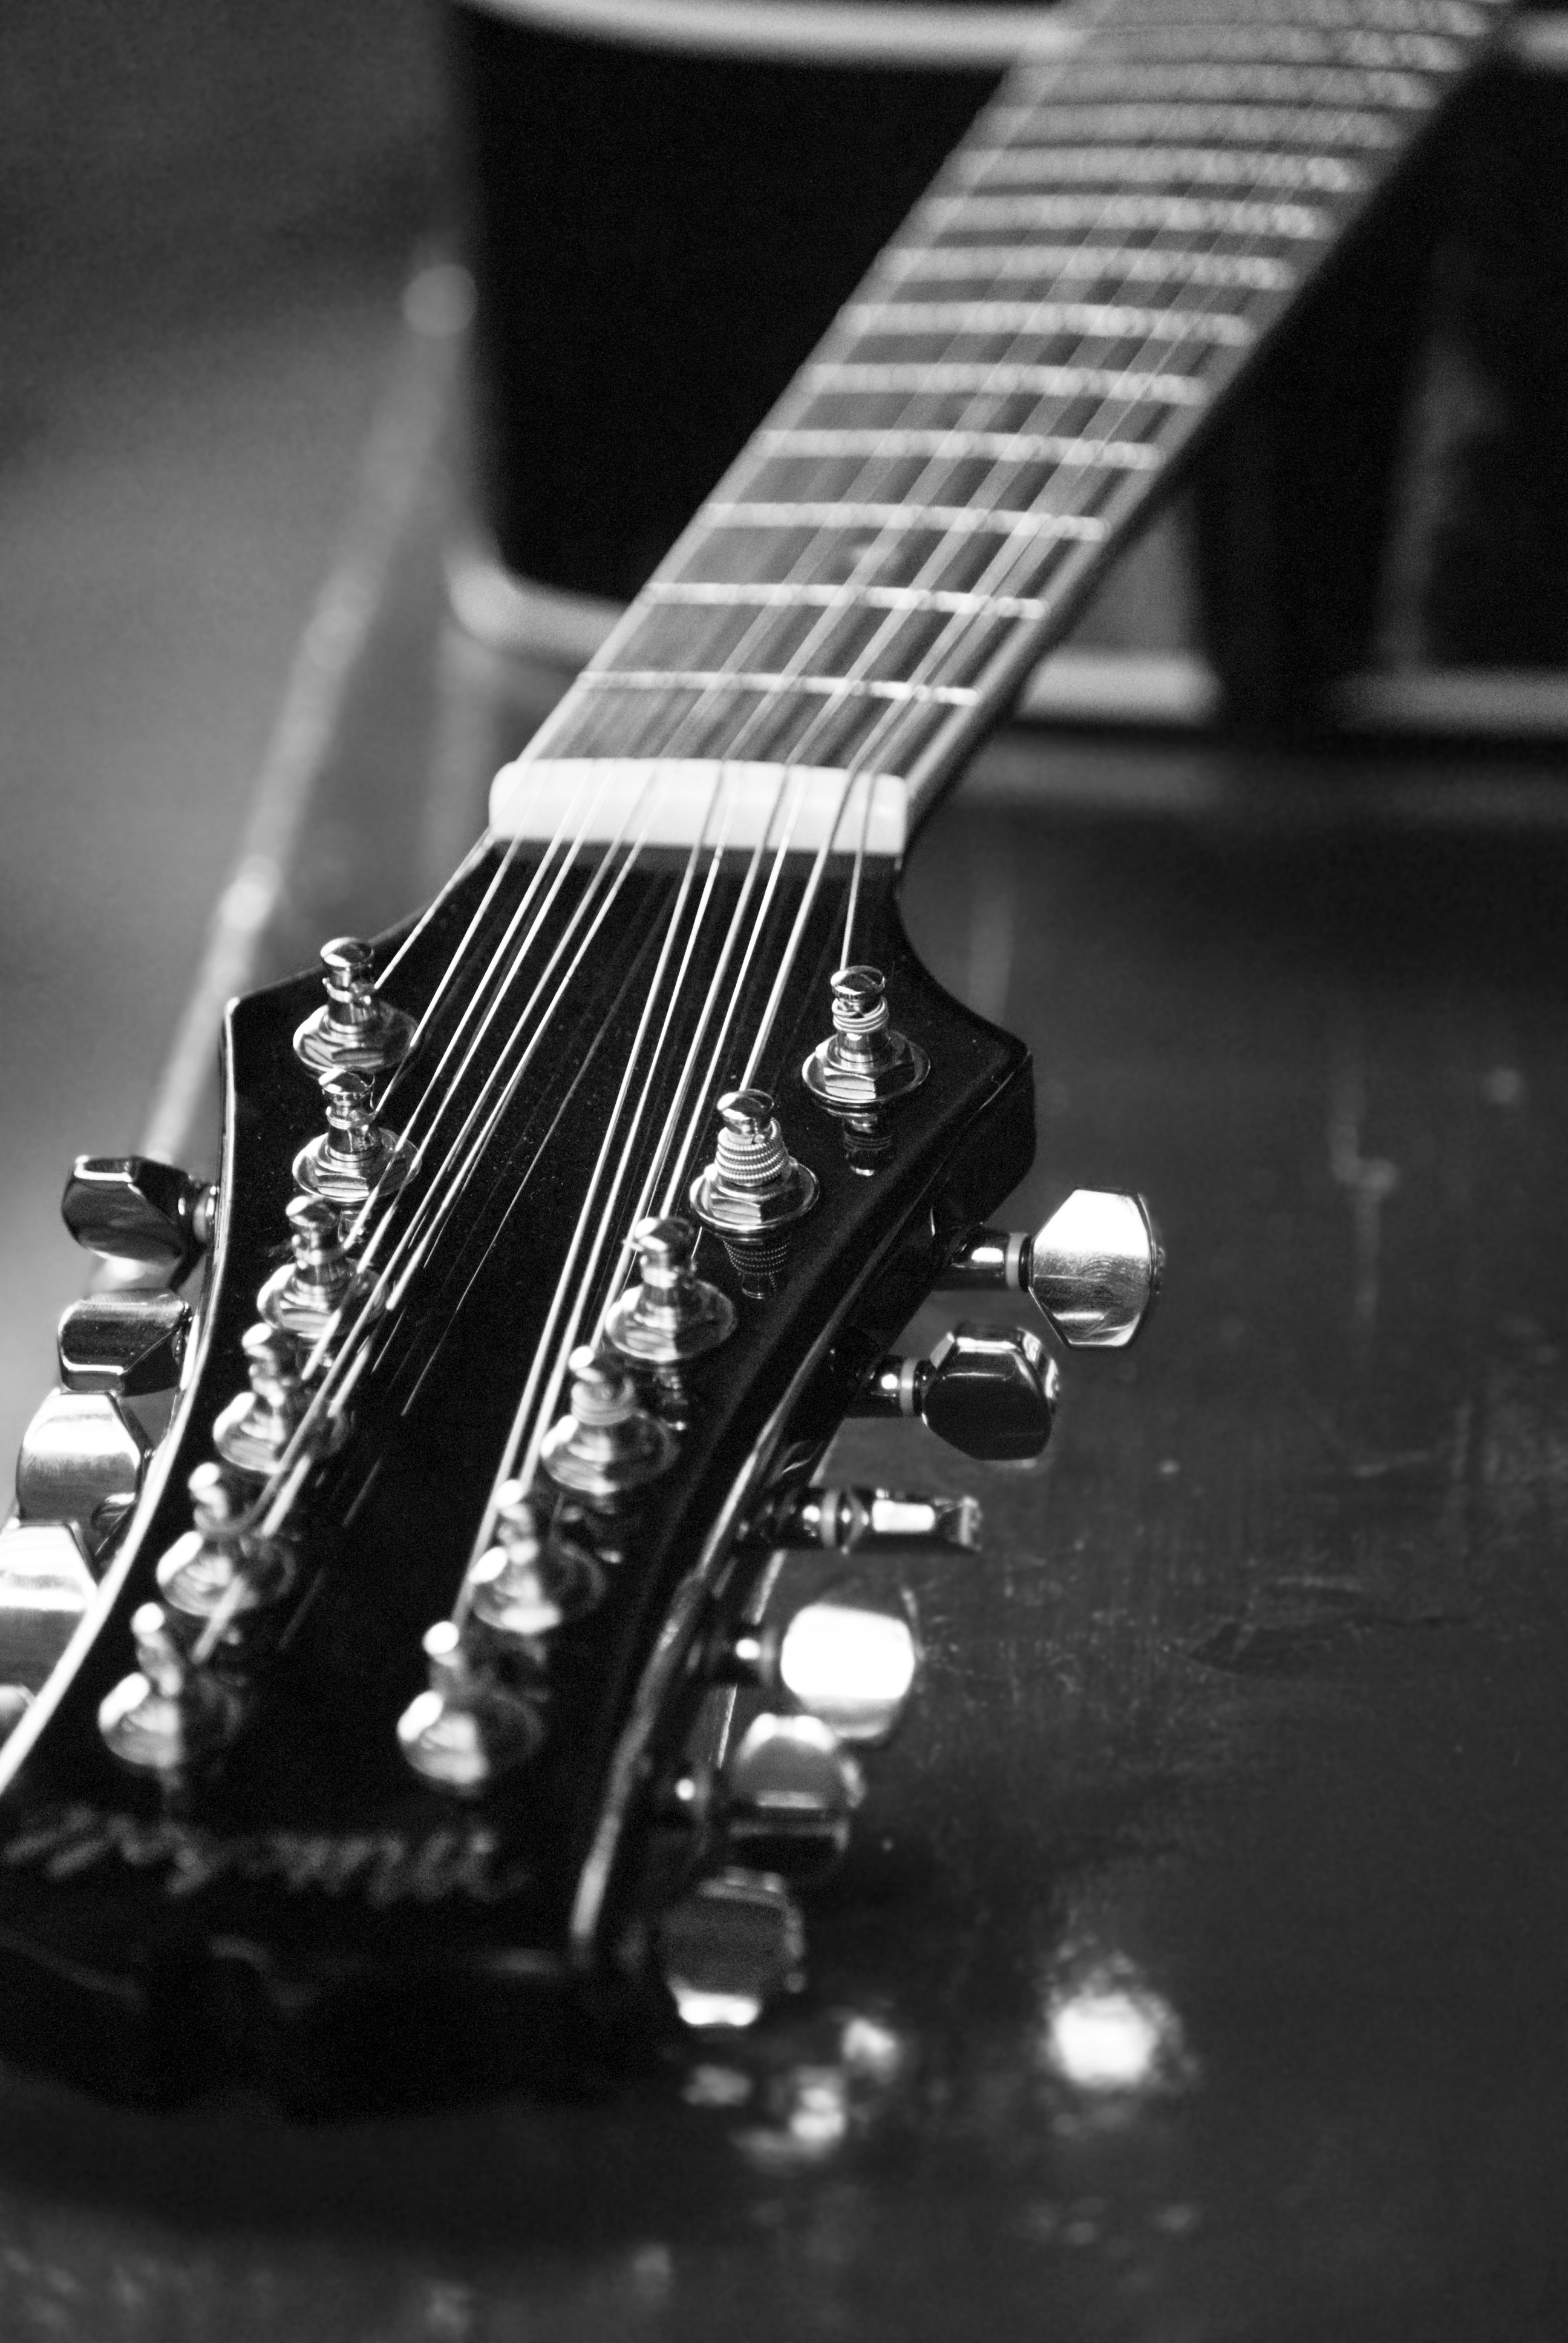 Twelve String Guitar, 12, Black, Closeup, Guitar, HQ Photo